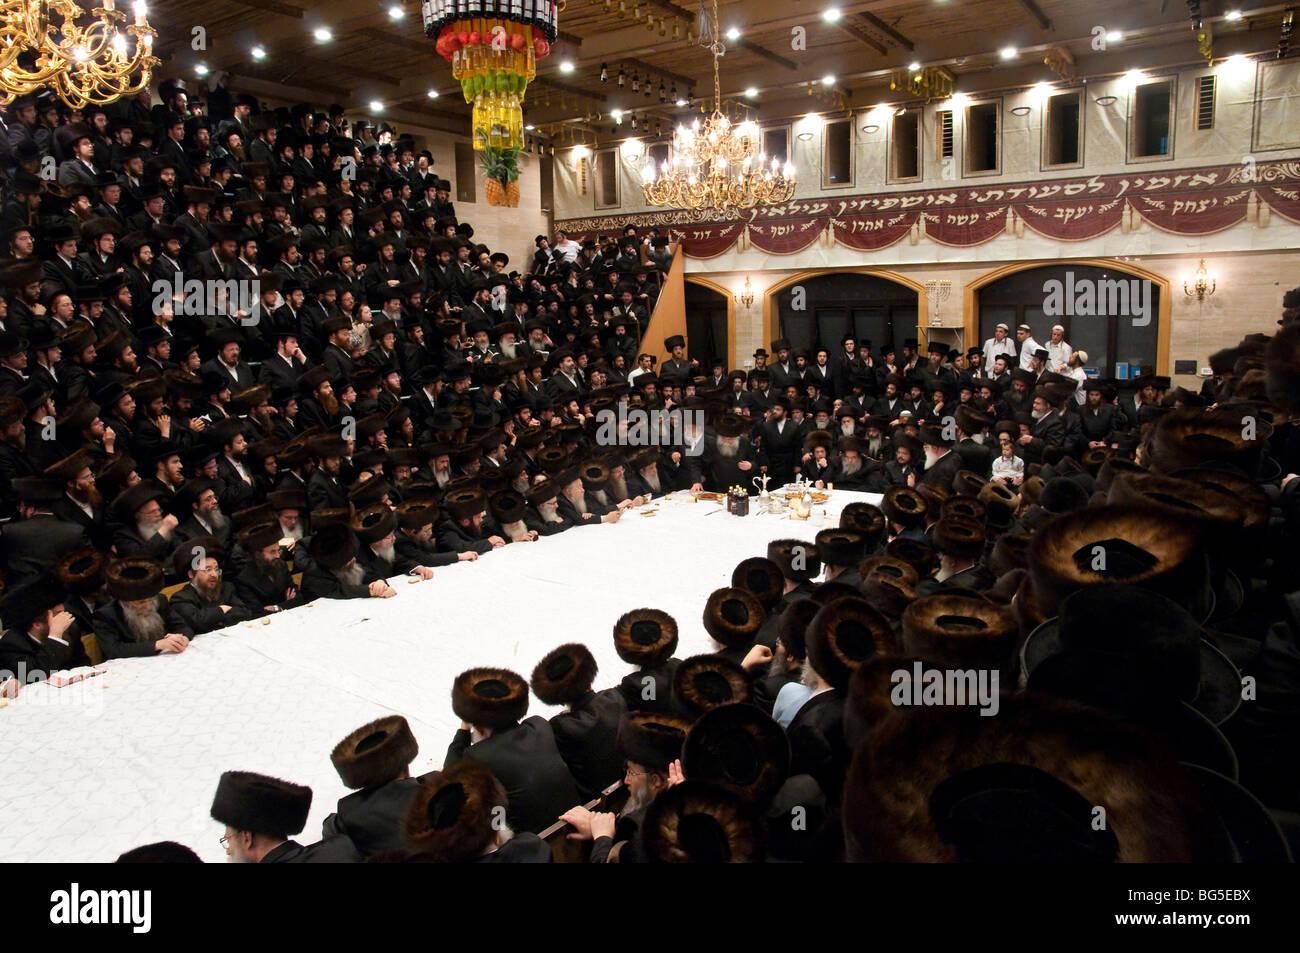 Belz tish celebration during the Sukkot festival - Stock Image